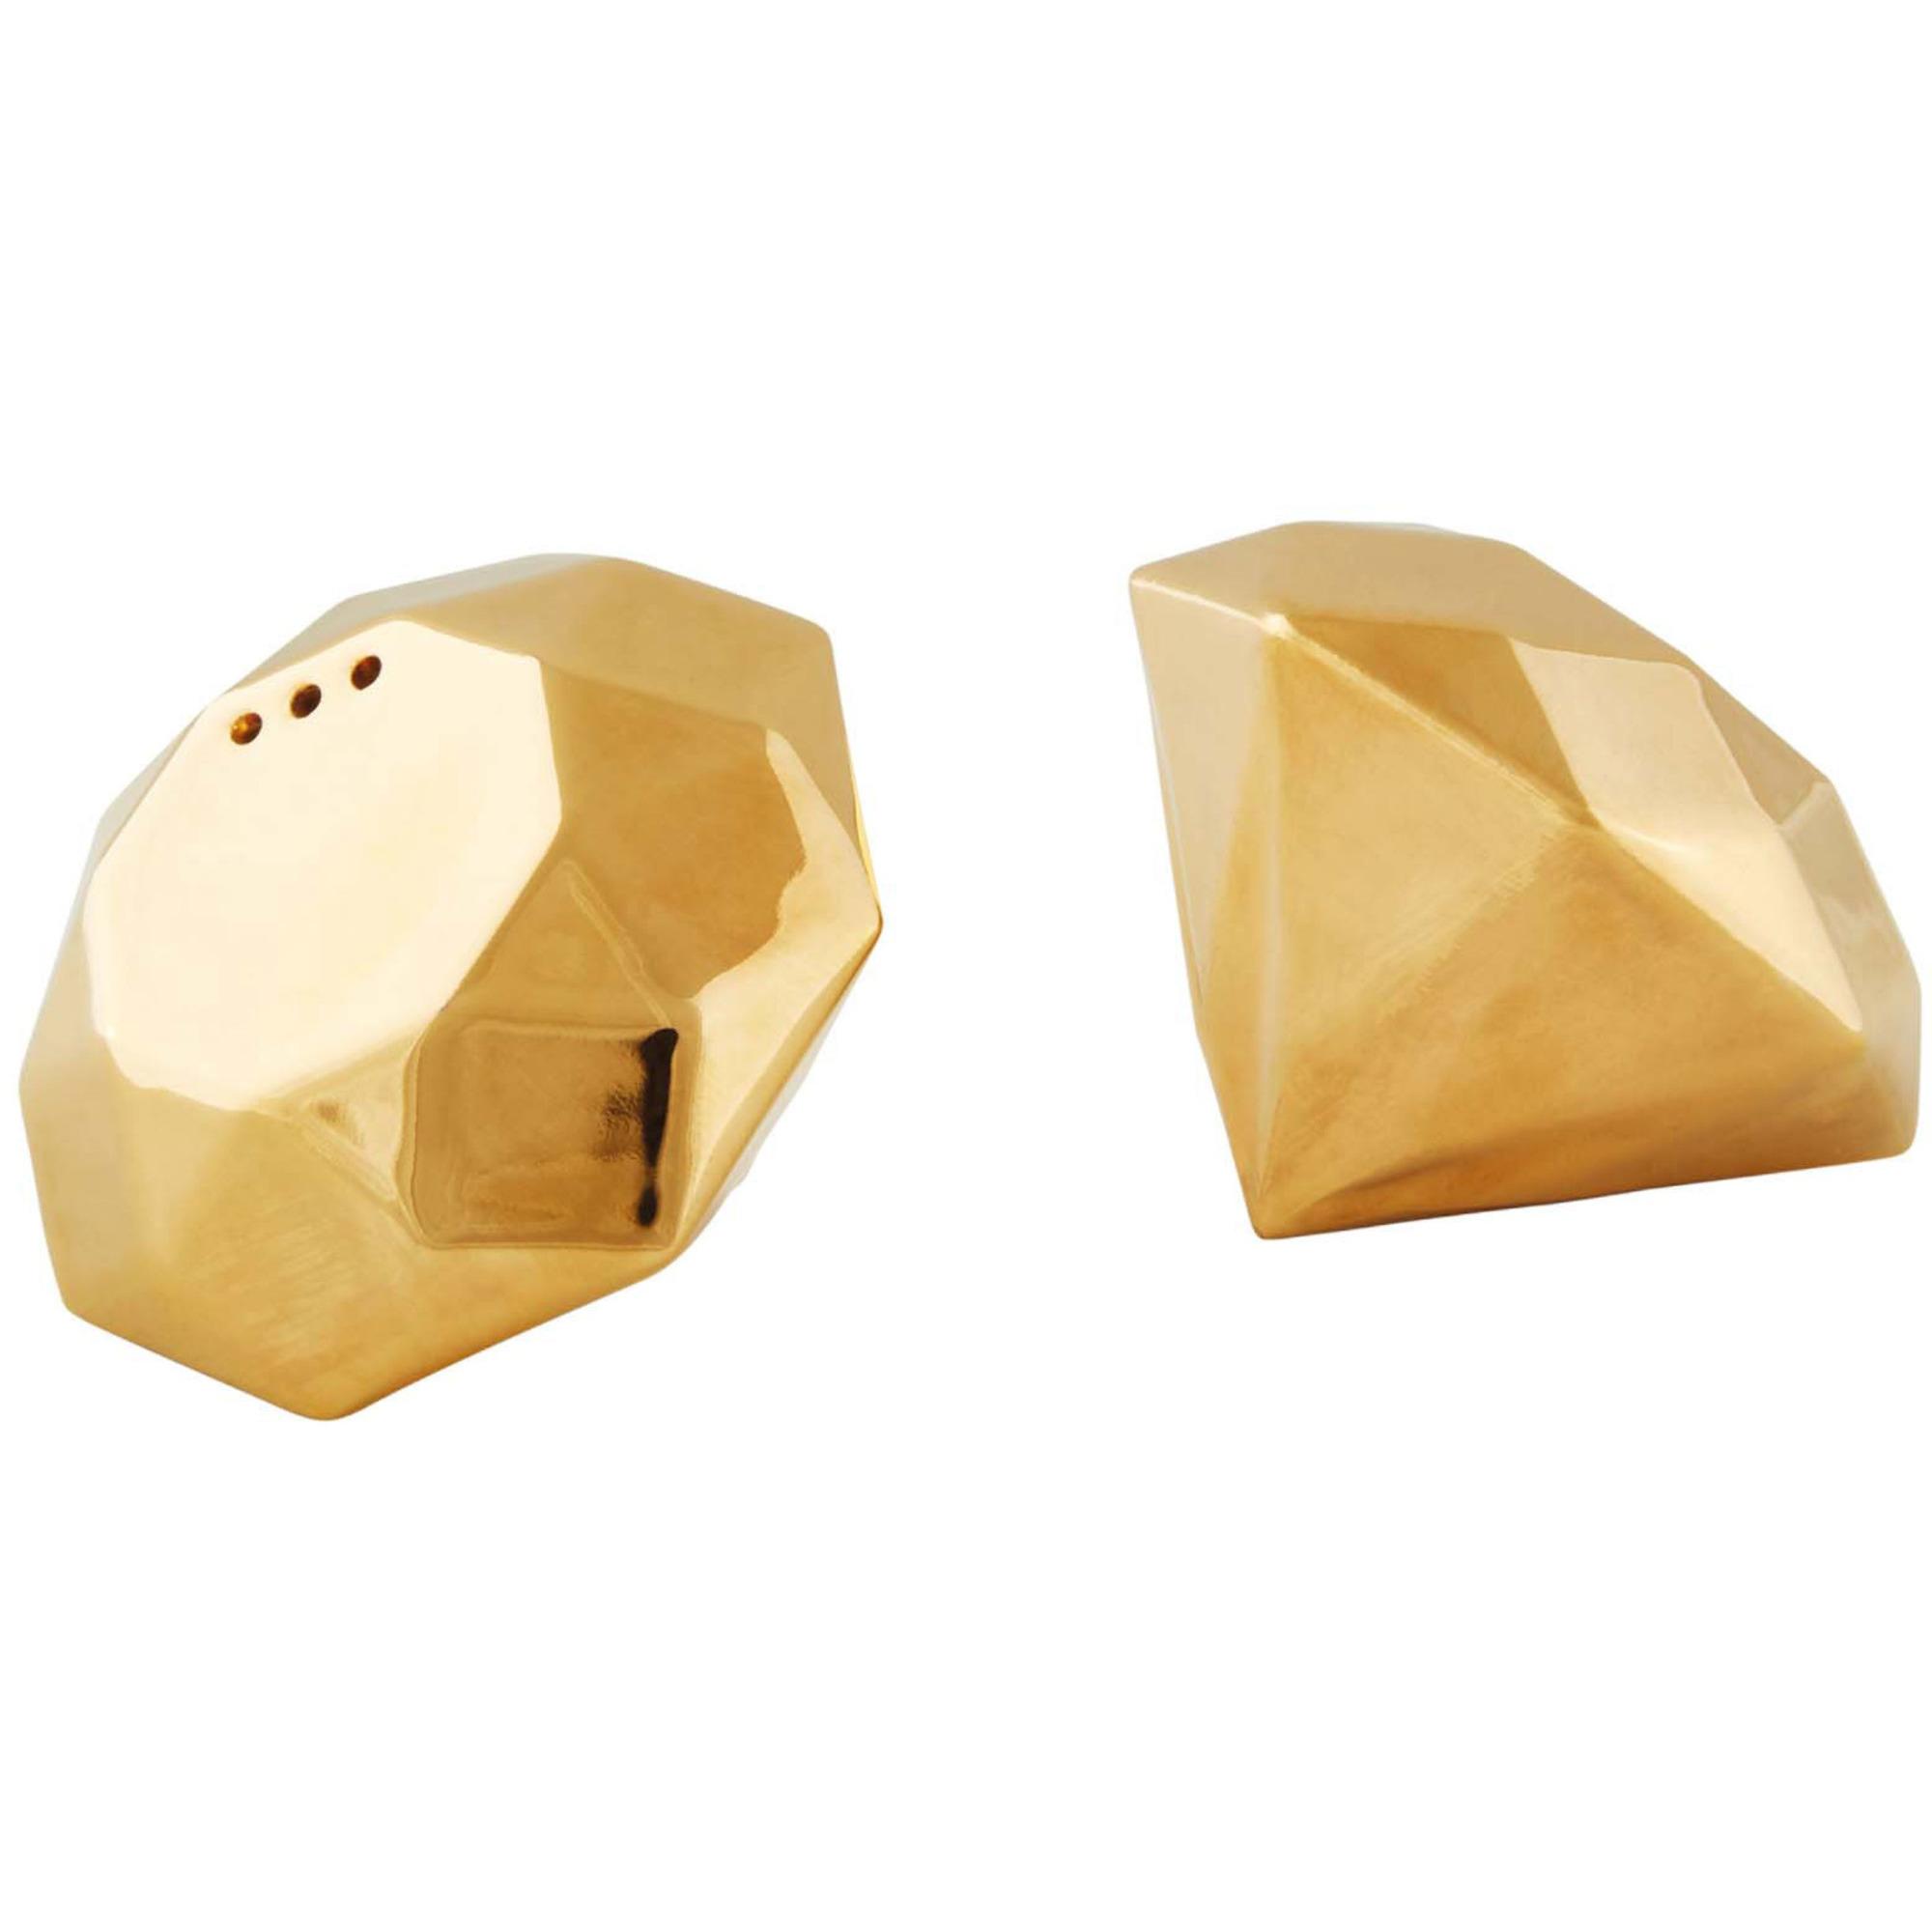 Fyrklövern Diamond Gold Salt- och pepparkar